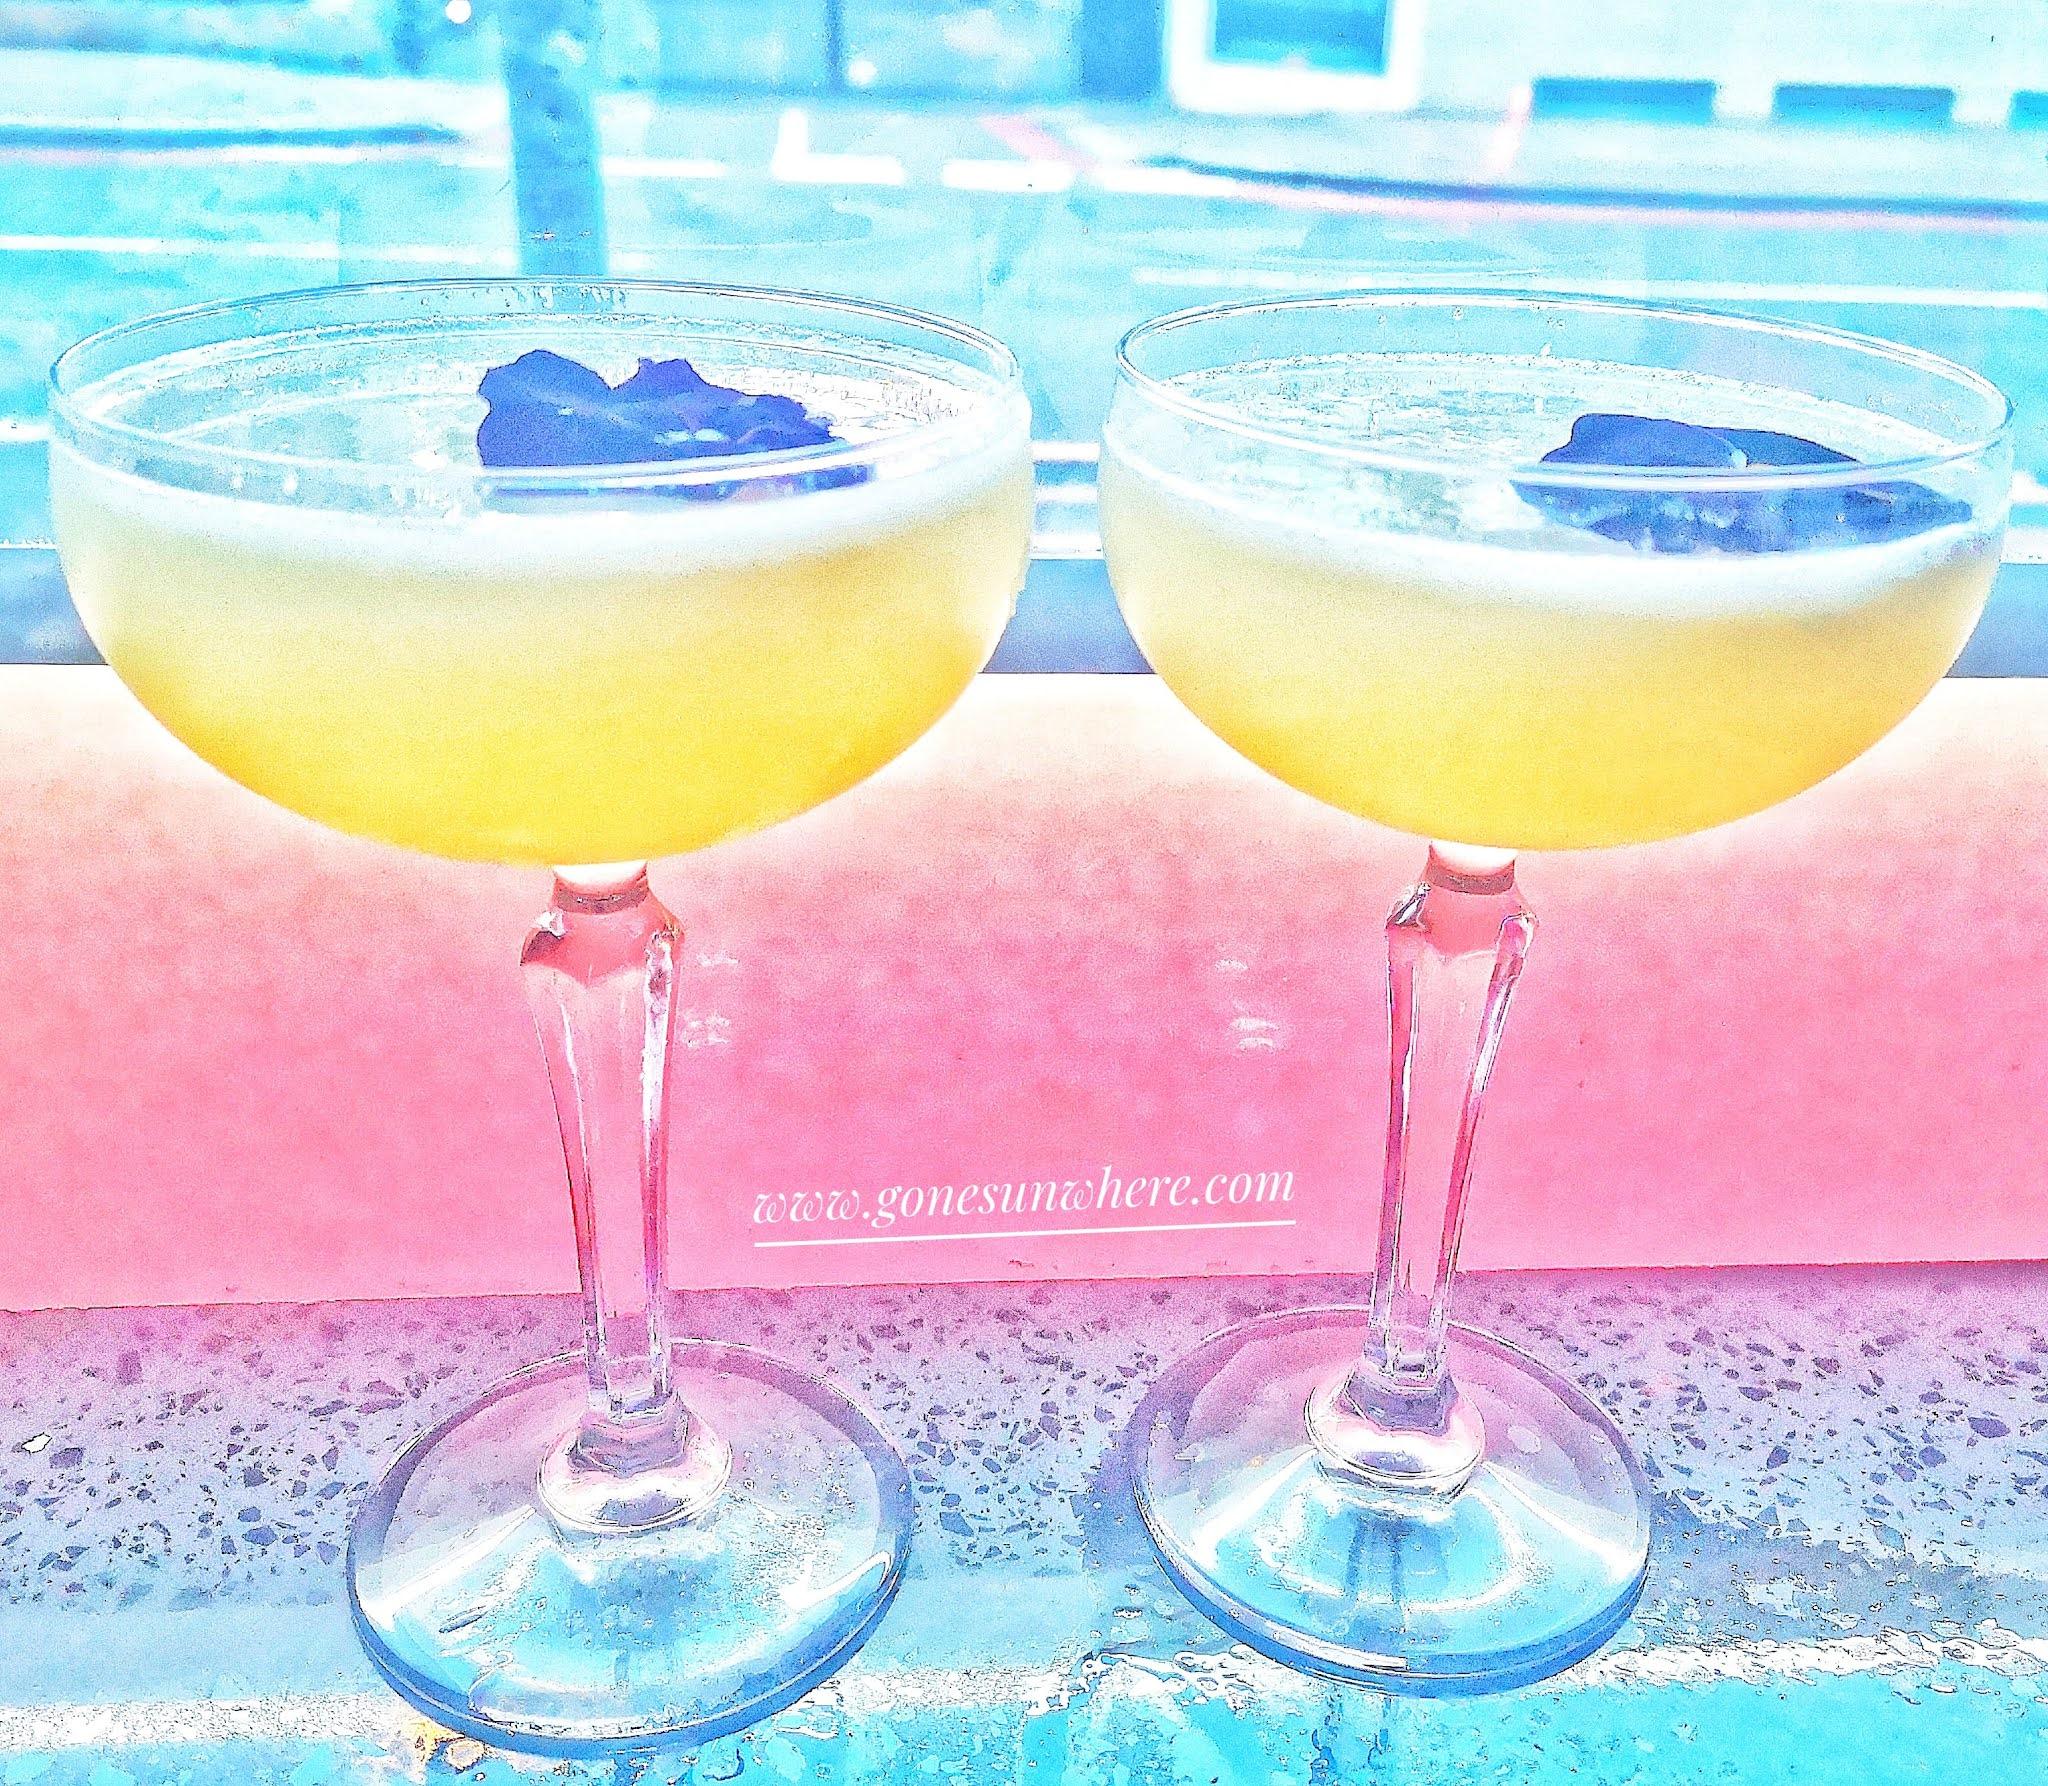 Ball pit cocktail bar